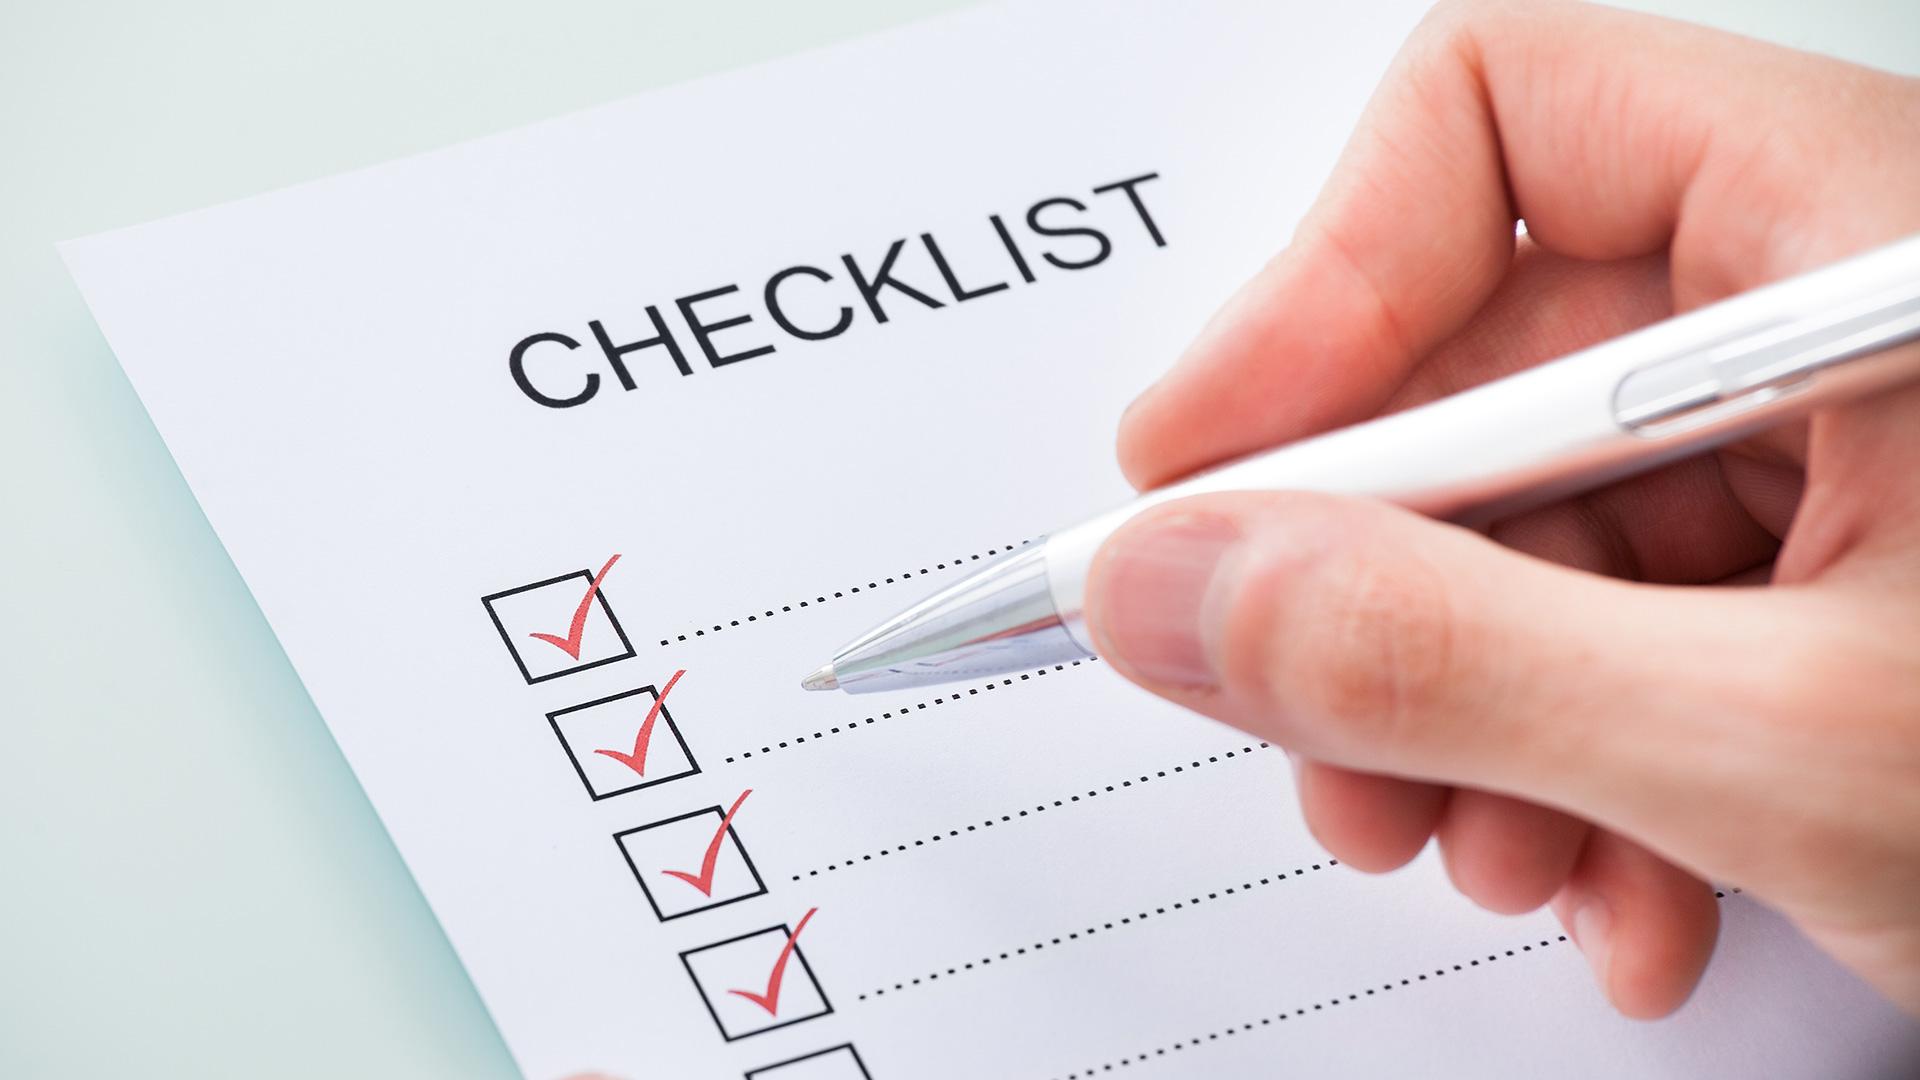 checklist ss 1920 - Чек-лист перед путешествием